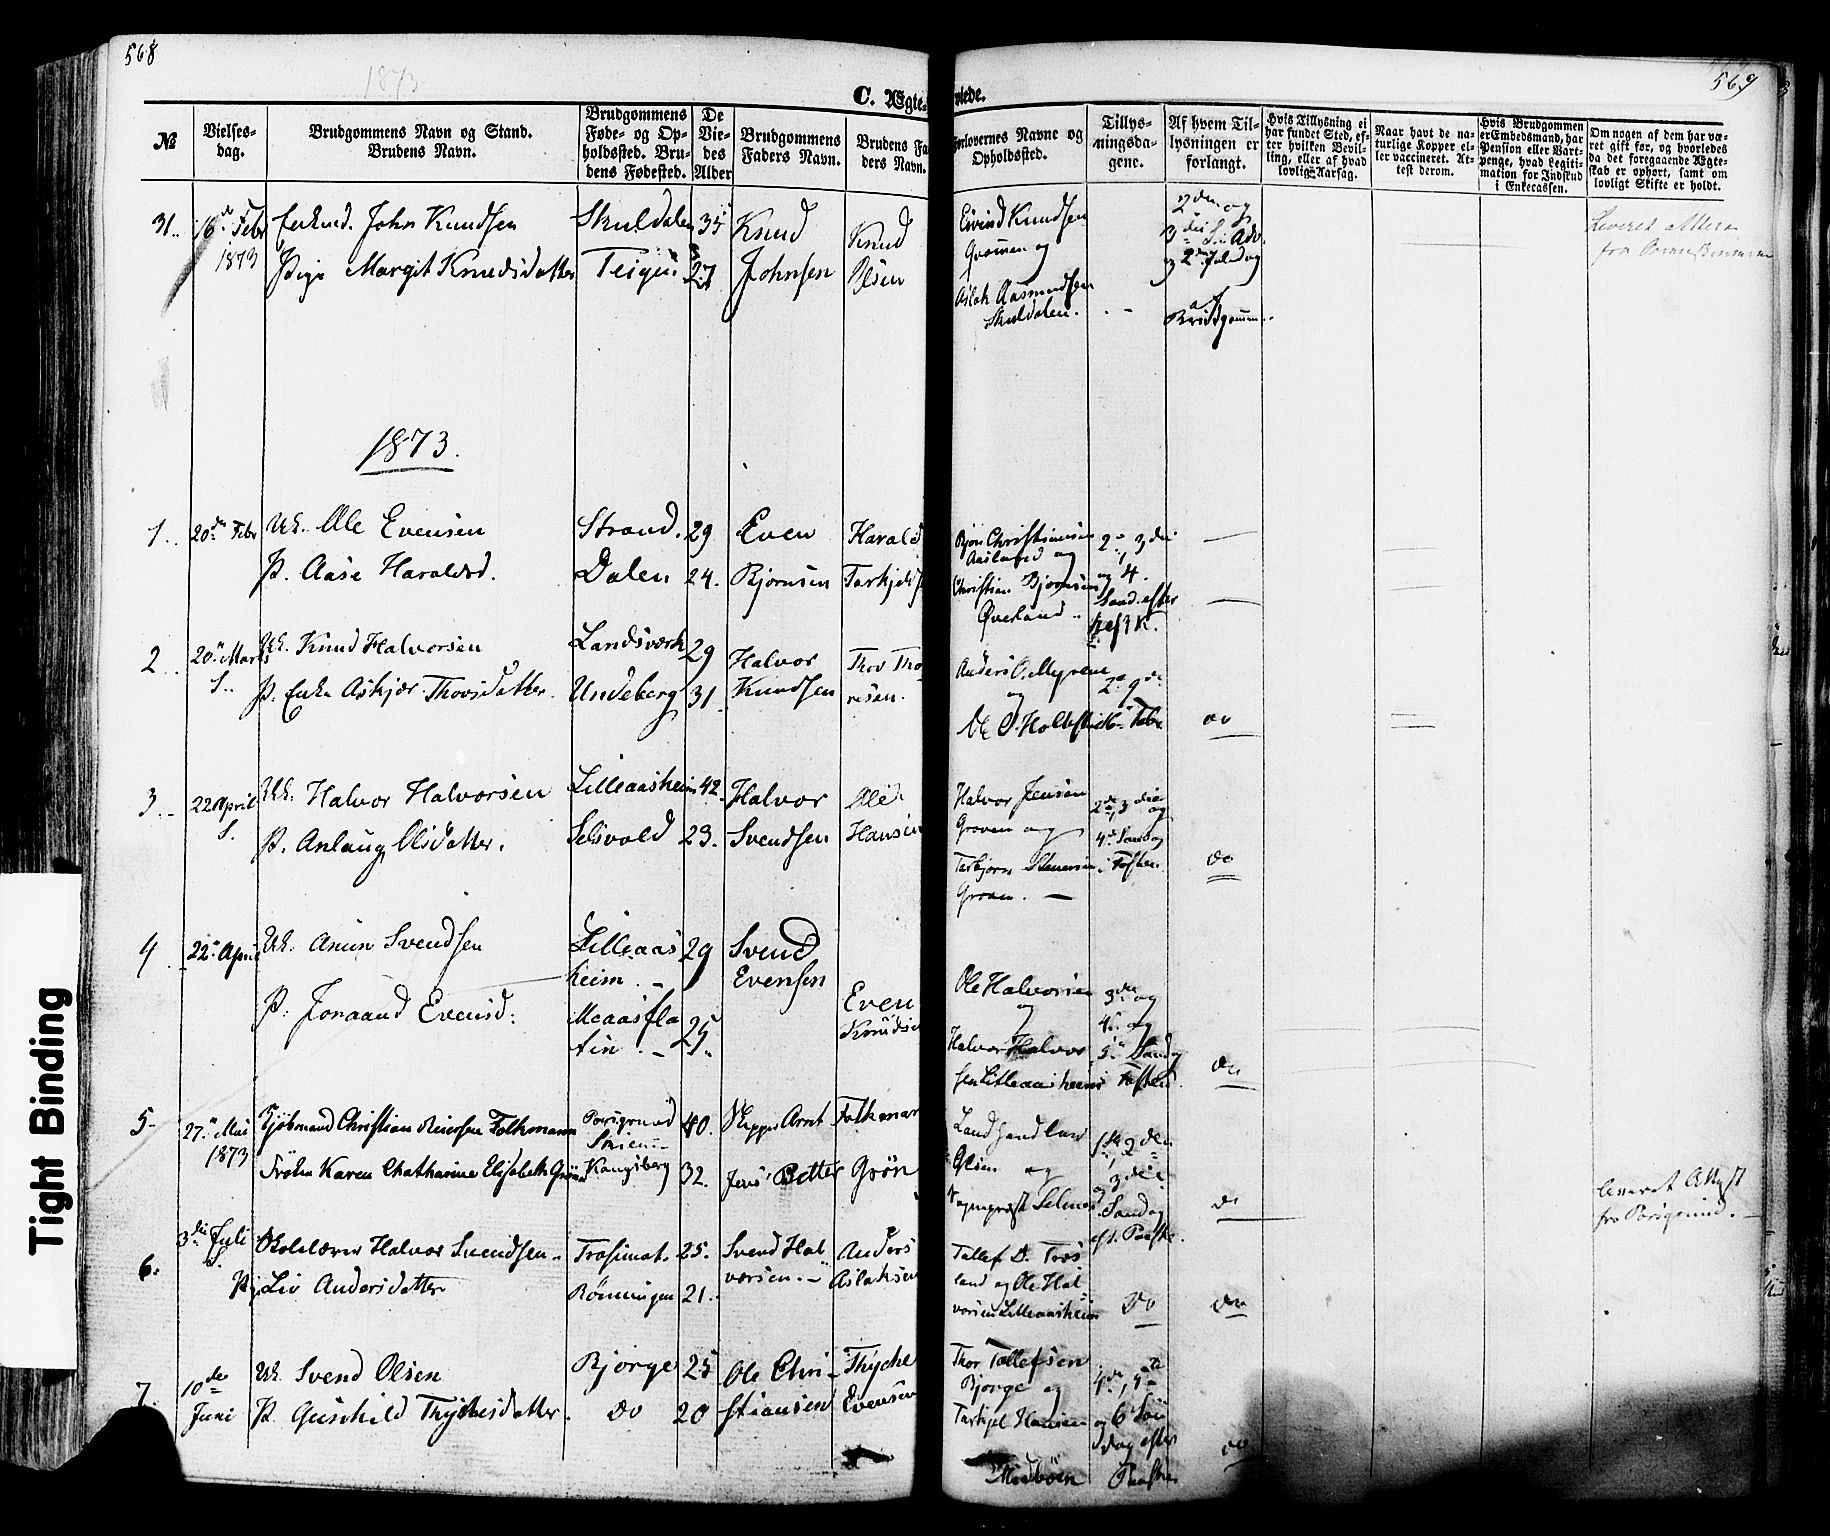 SAKO, Seljord kirkebøker, F/Fa/L0013: Parish register (official) no. I 13, 1866-1876, p. 568-569